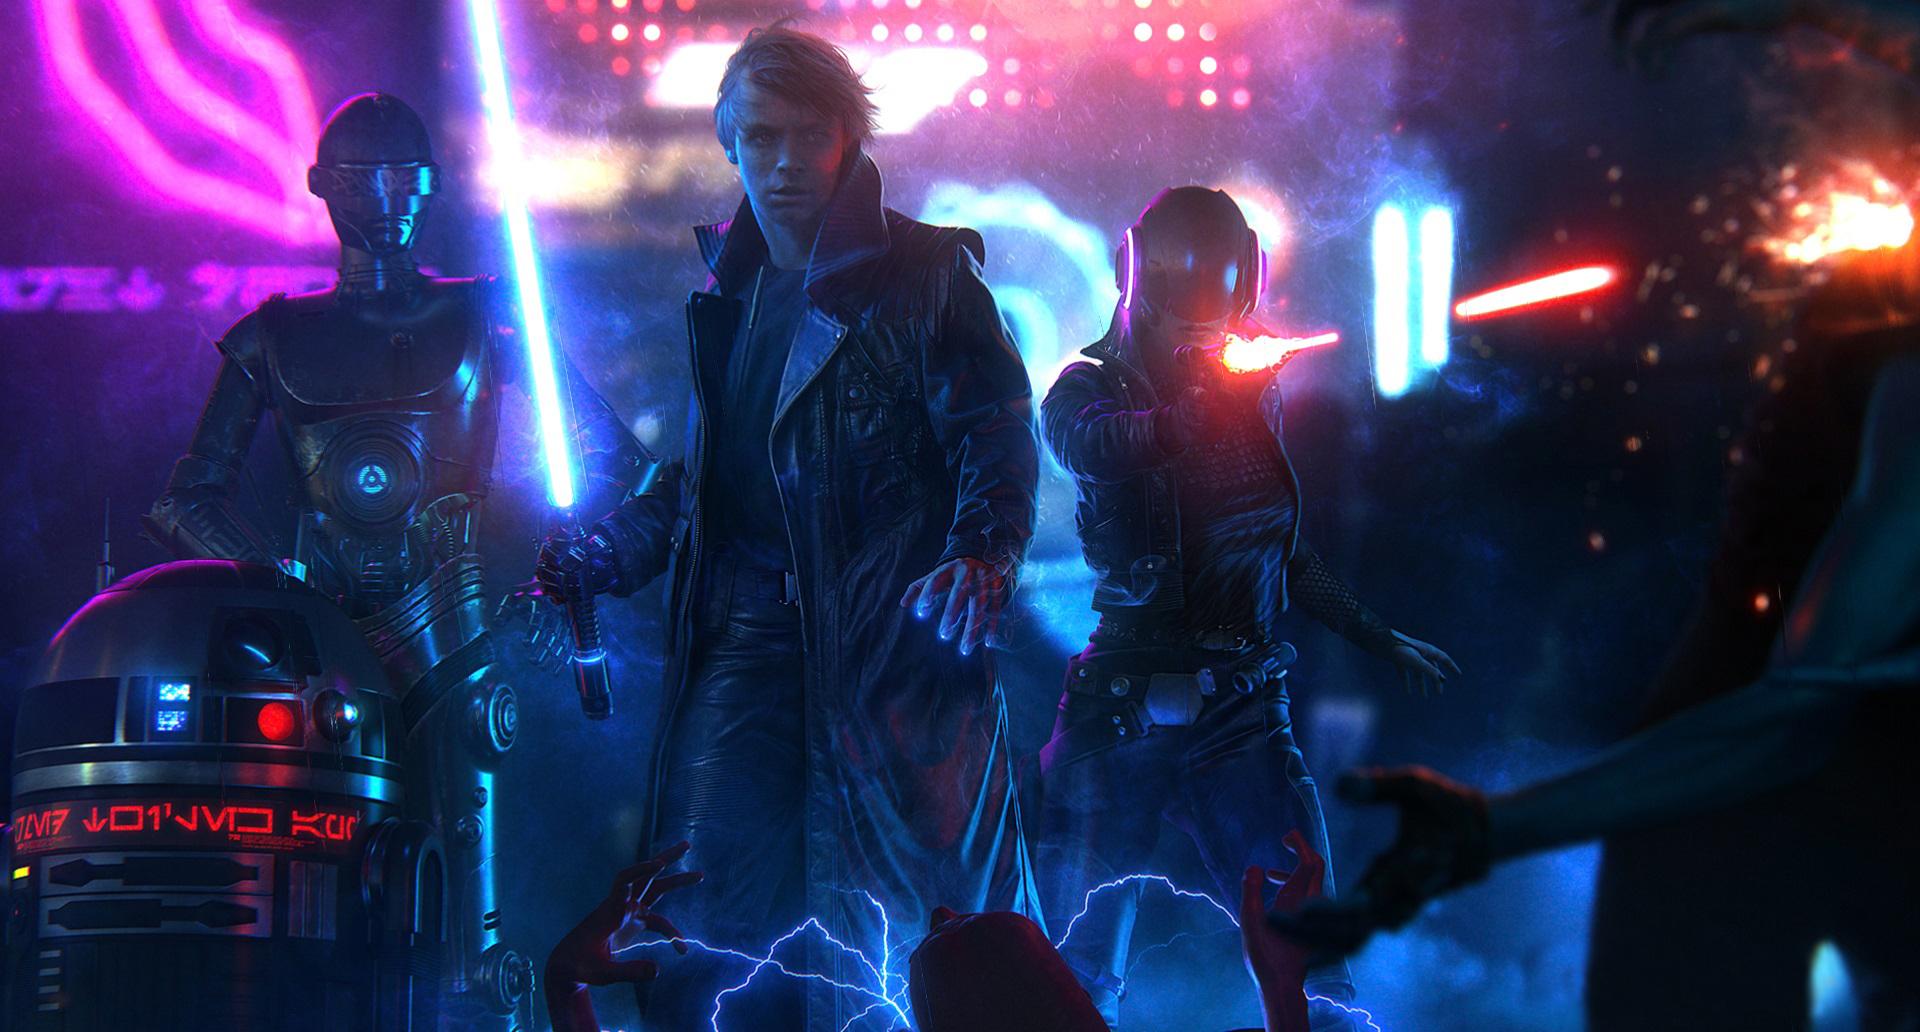 Star Wars Blade Runner Luke Skywalker Free Sci-fi Animated - Star Wars Cyberpunk Art , HD Wallpaper & Backgrounds